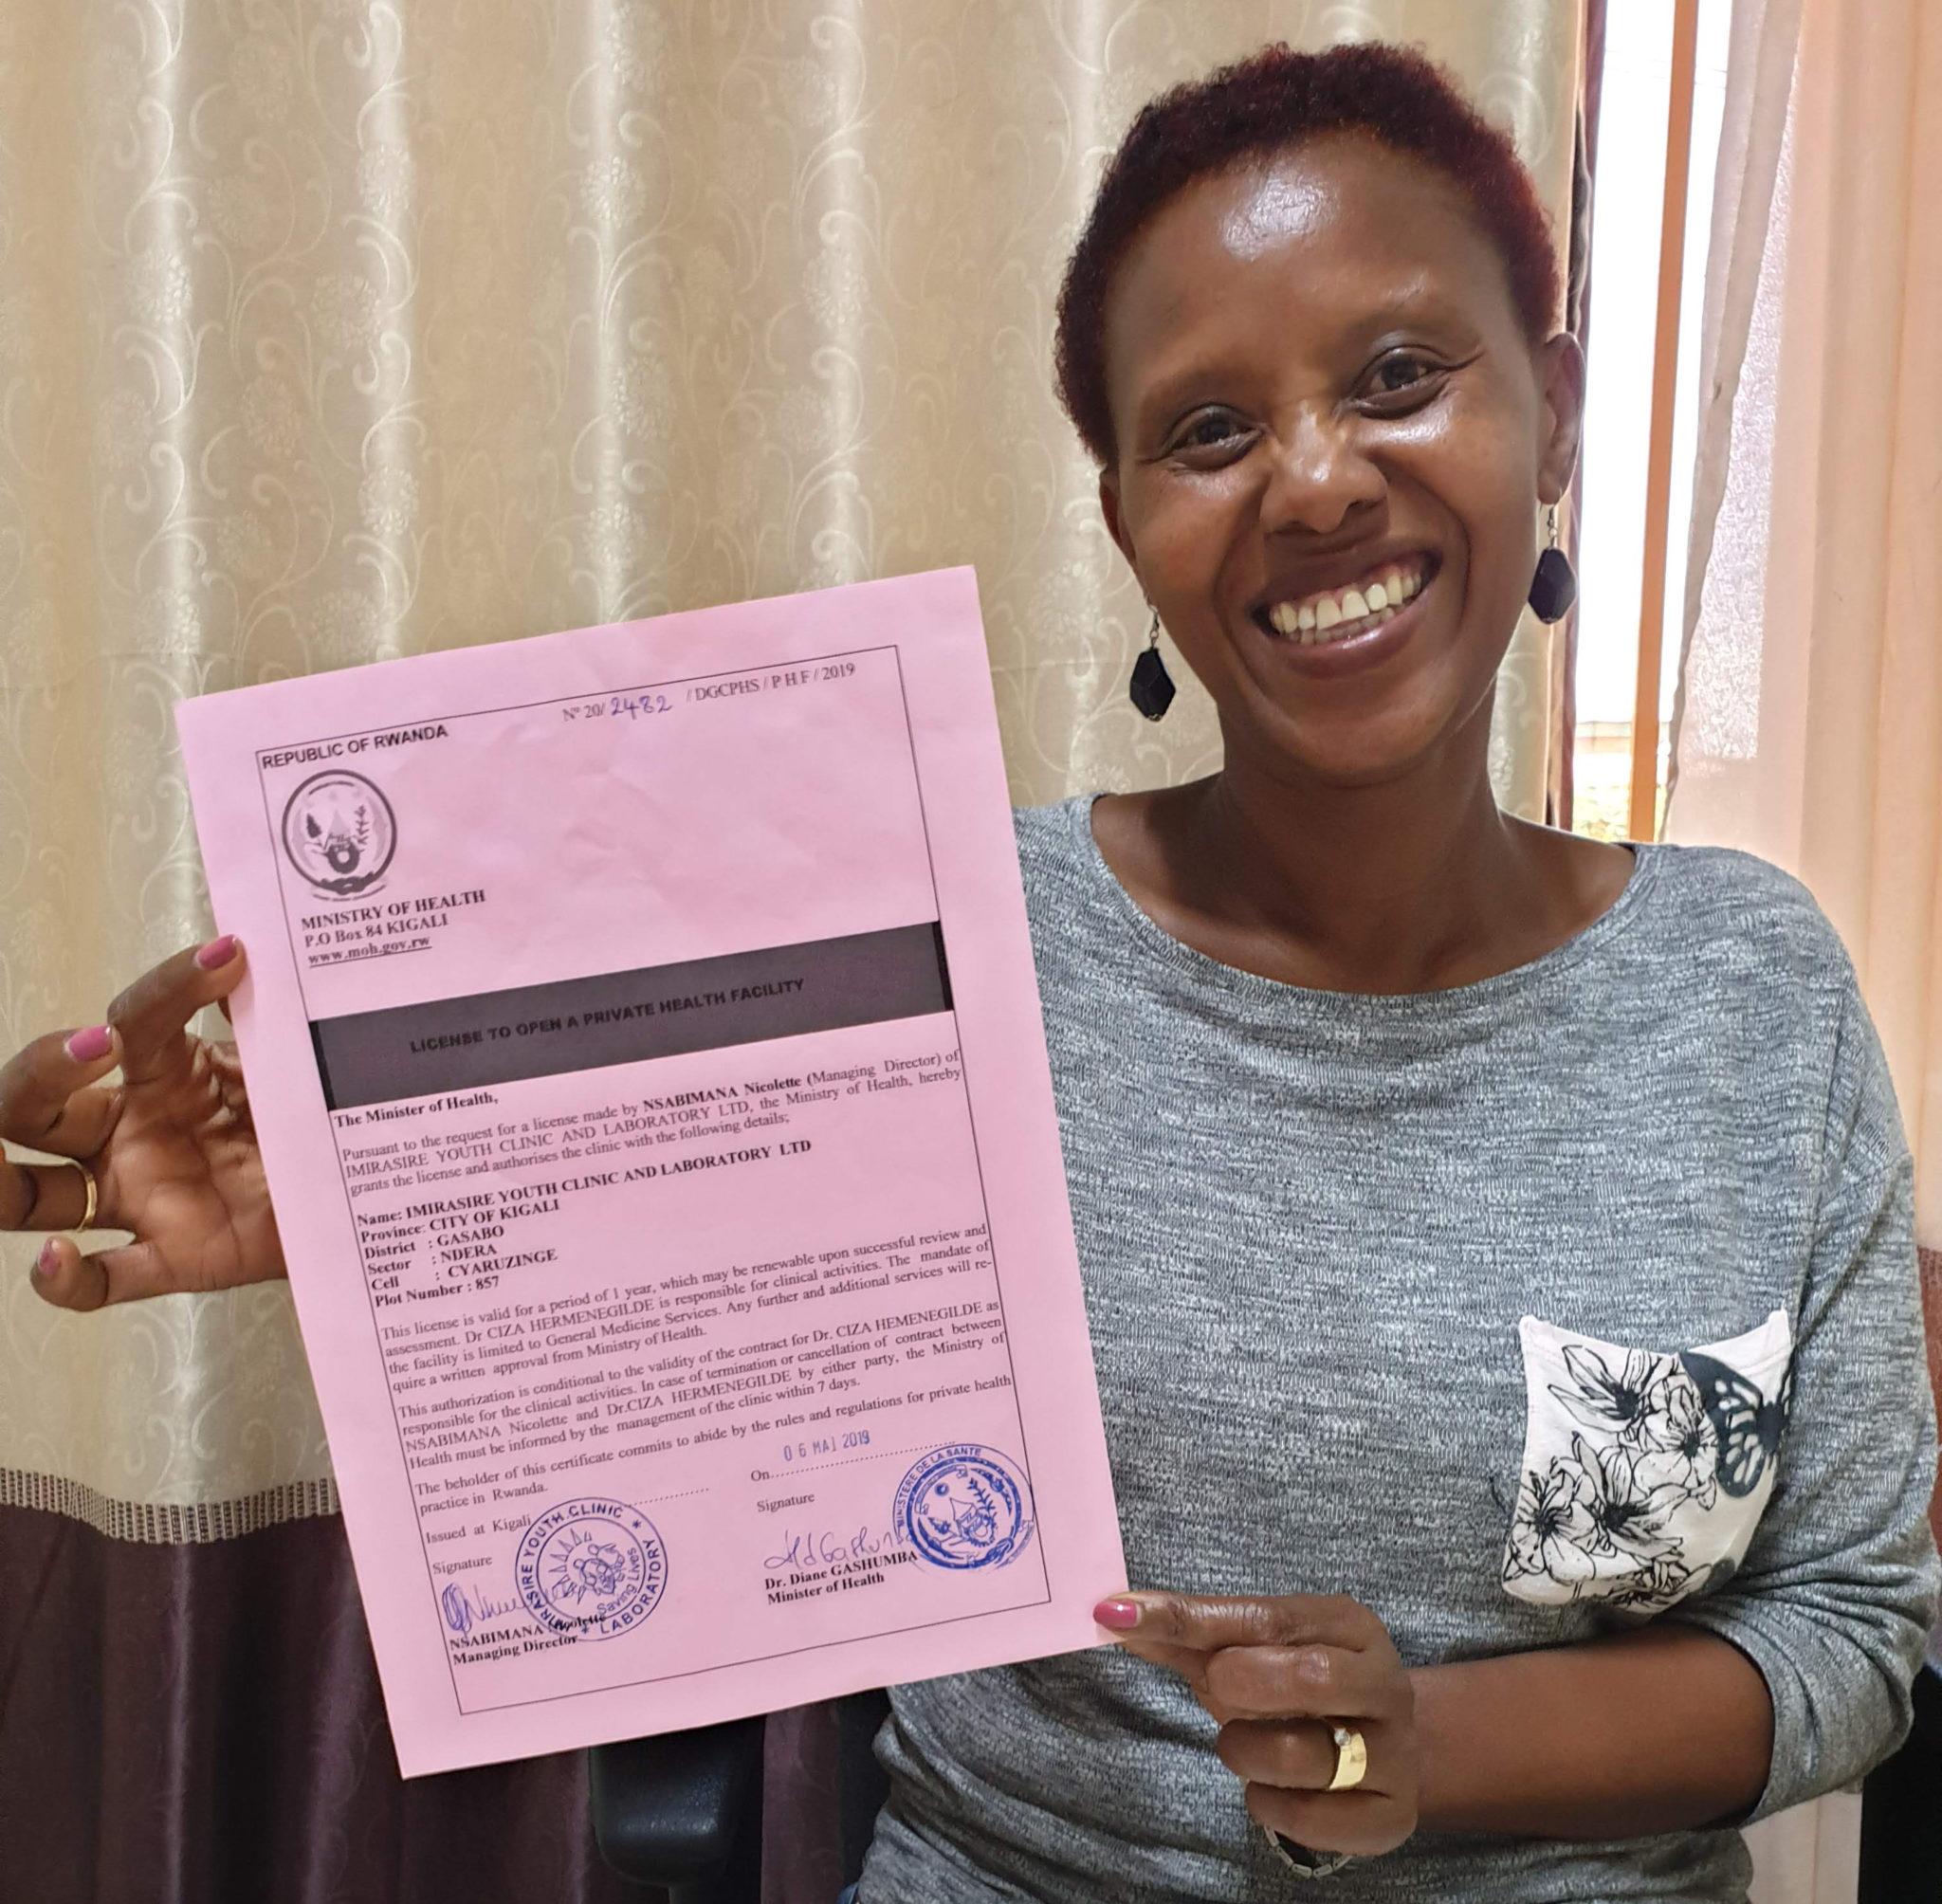 A heartwarming story from Rwanda